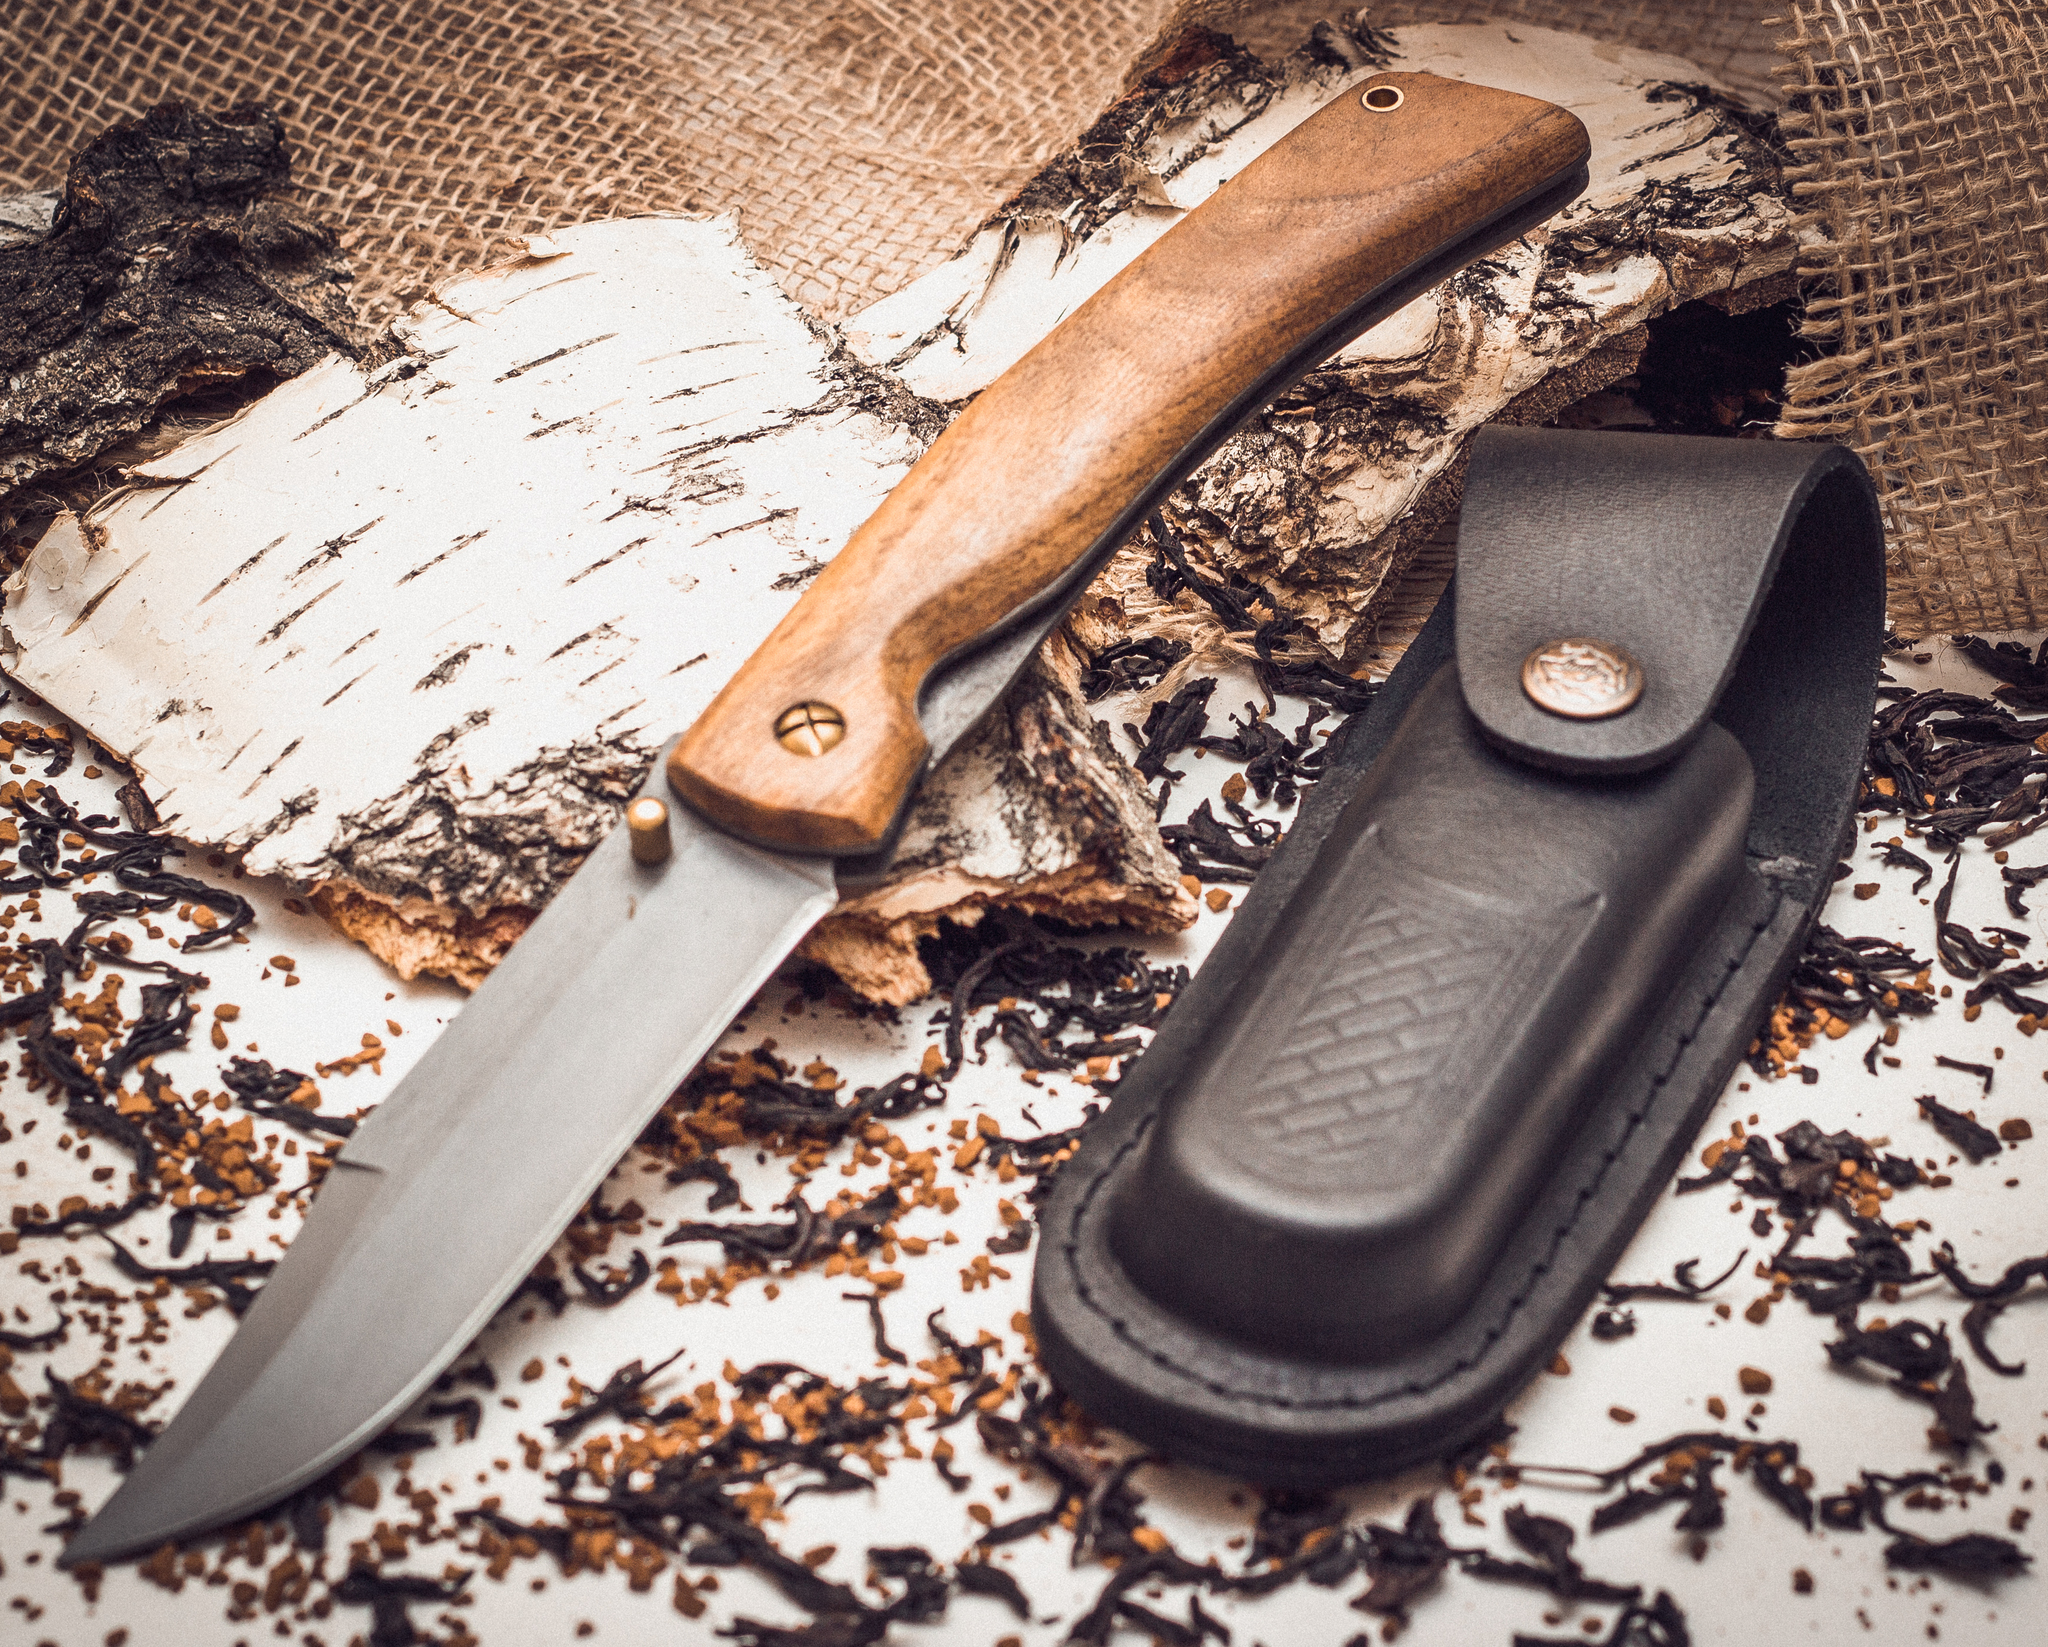 Фото 4 - Складной нож Храбрец, сталь 95х18, орех от Марычев